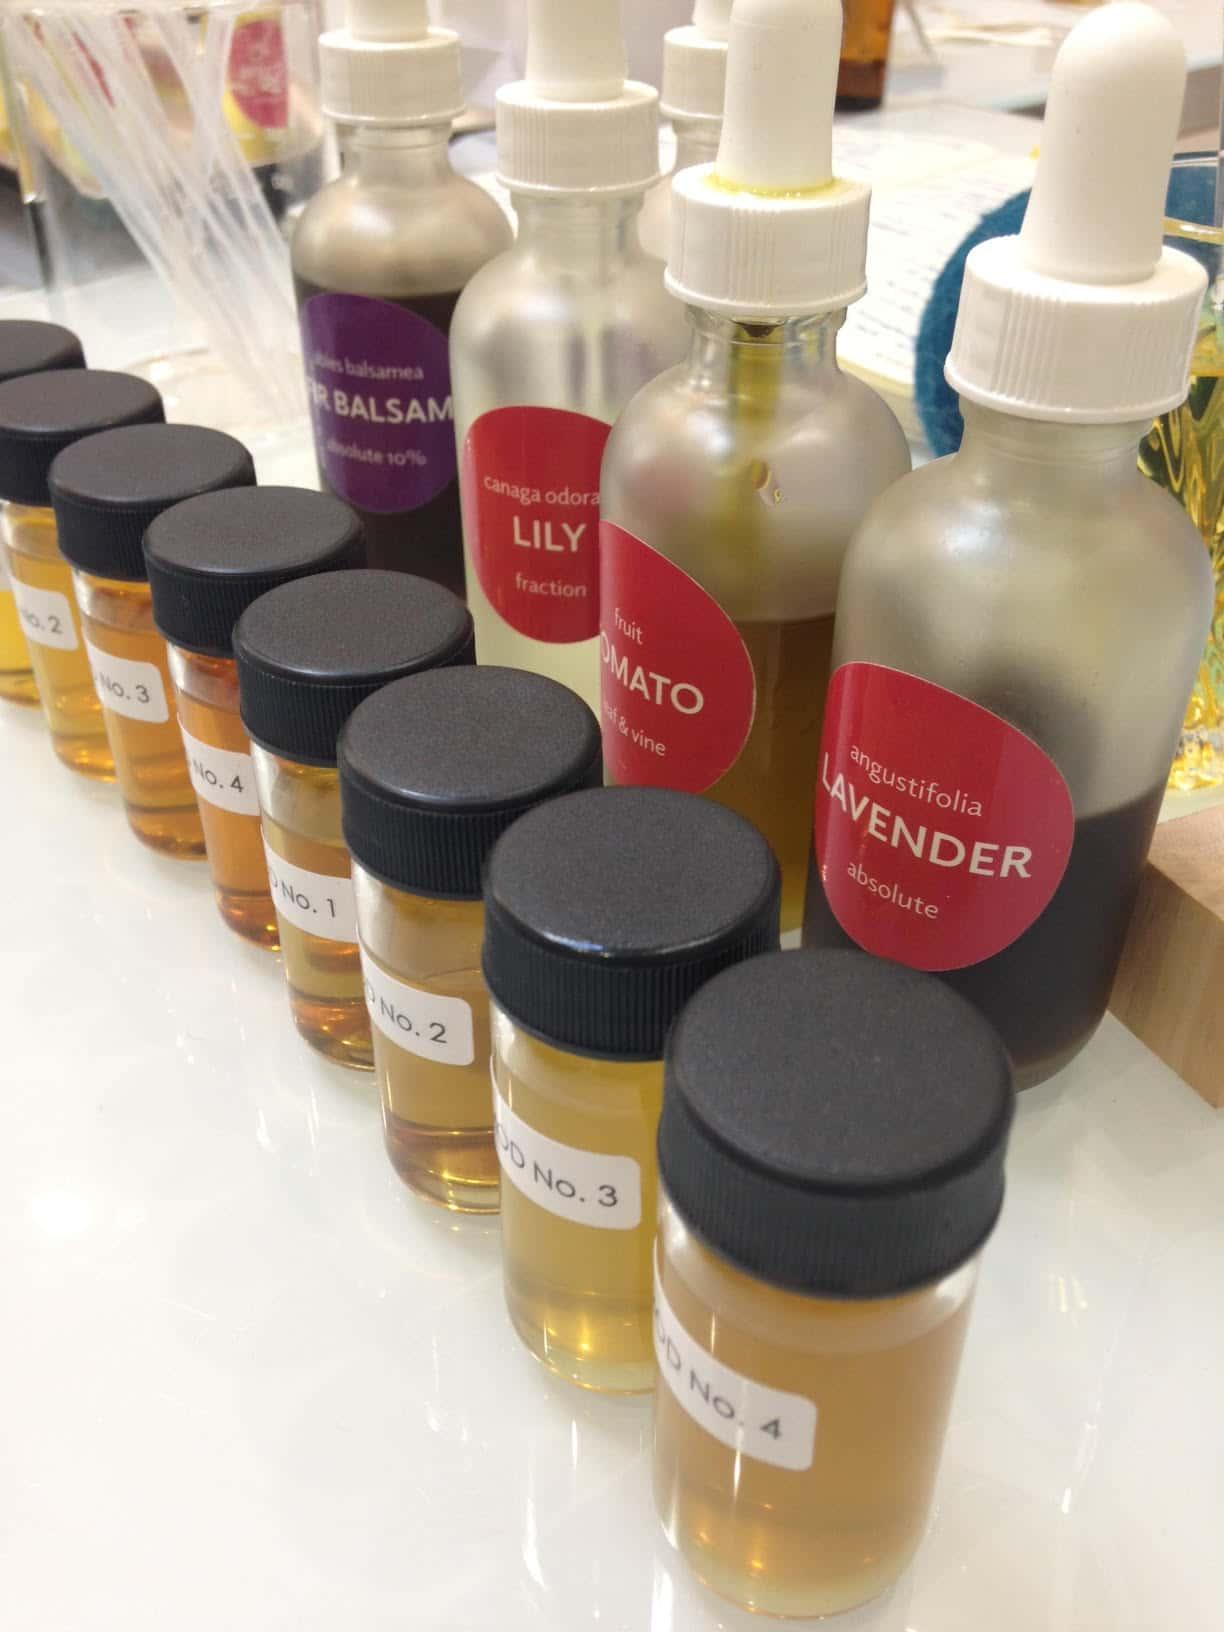 Providence Perfume and my natural perfume addiction